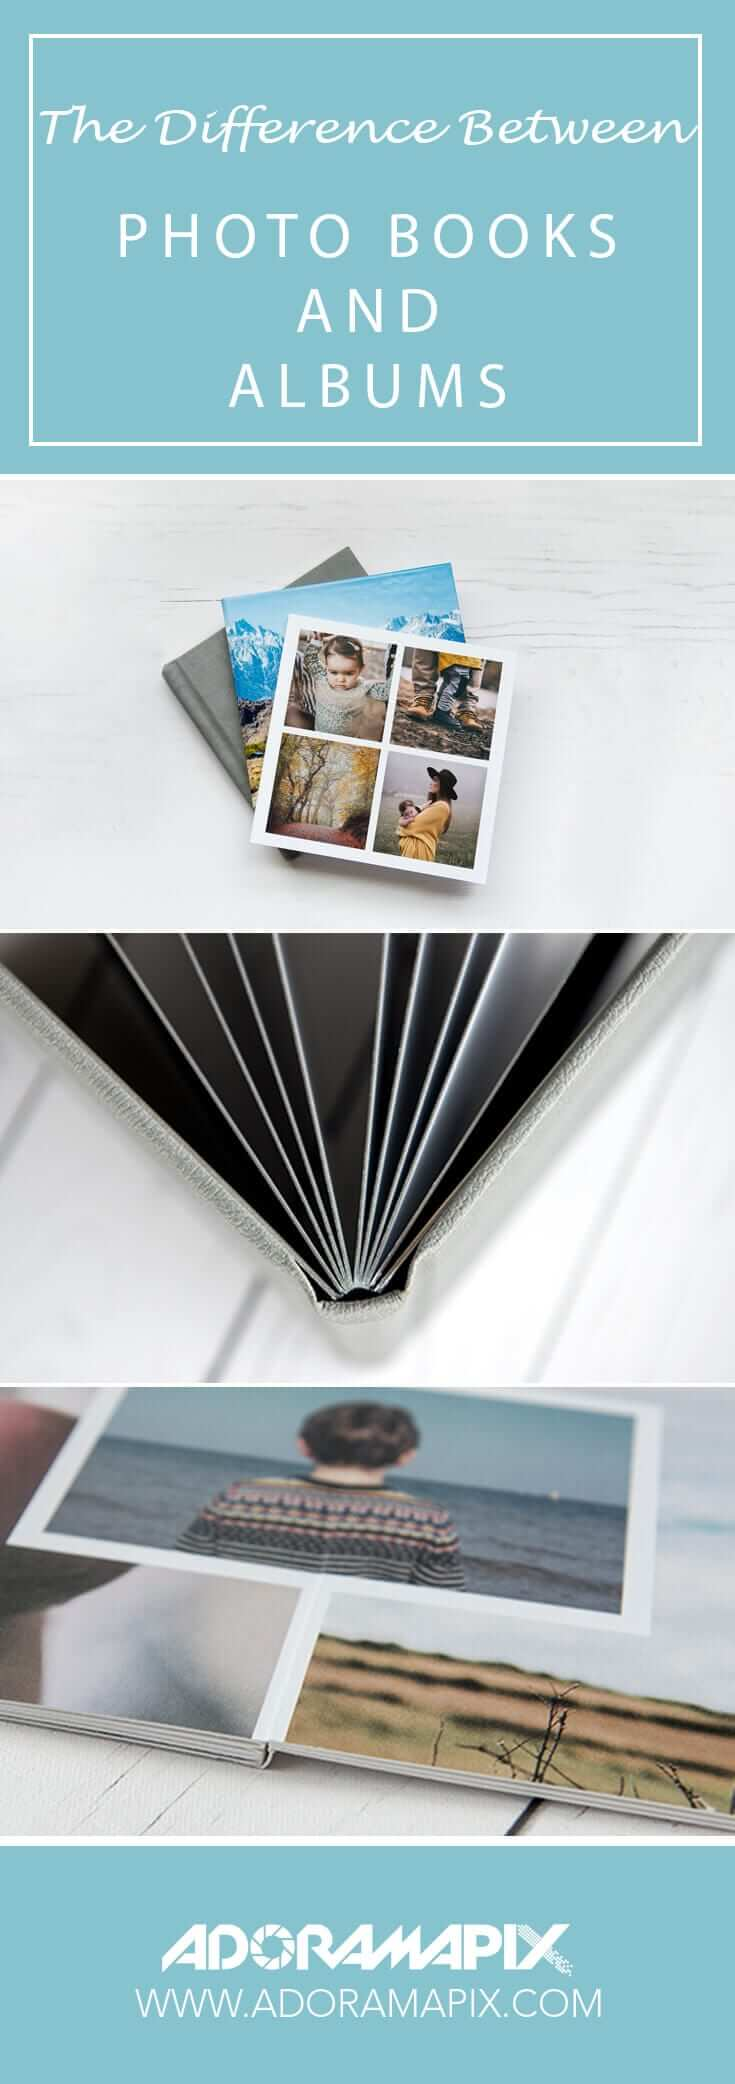 adoramapix photo books and albums